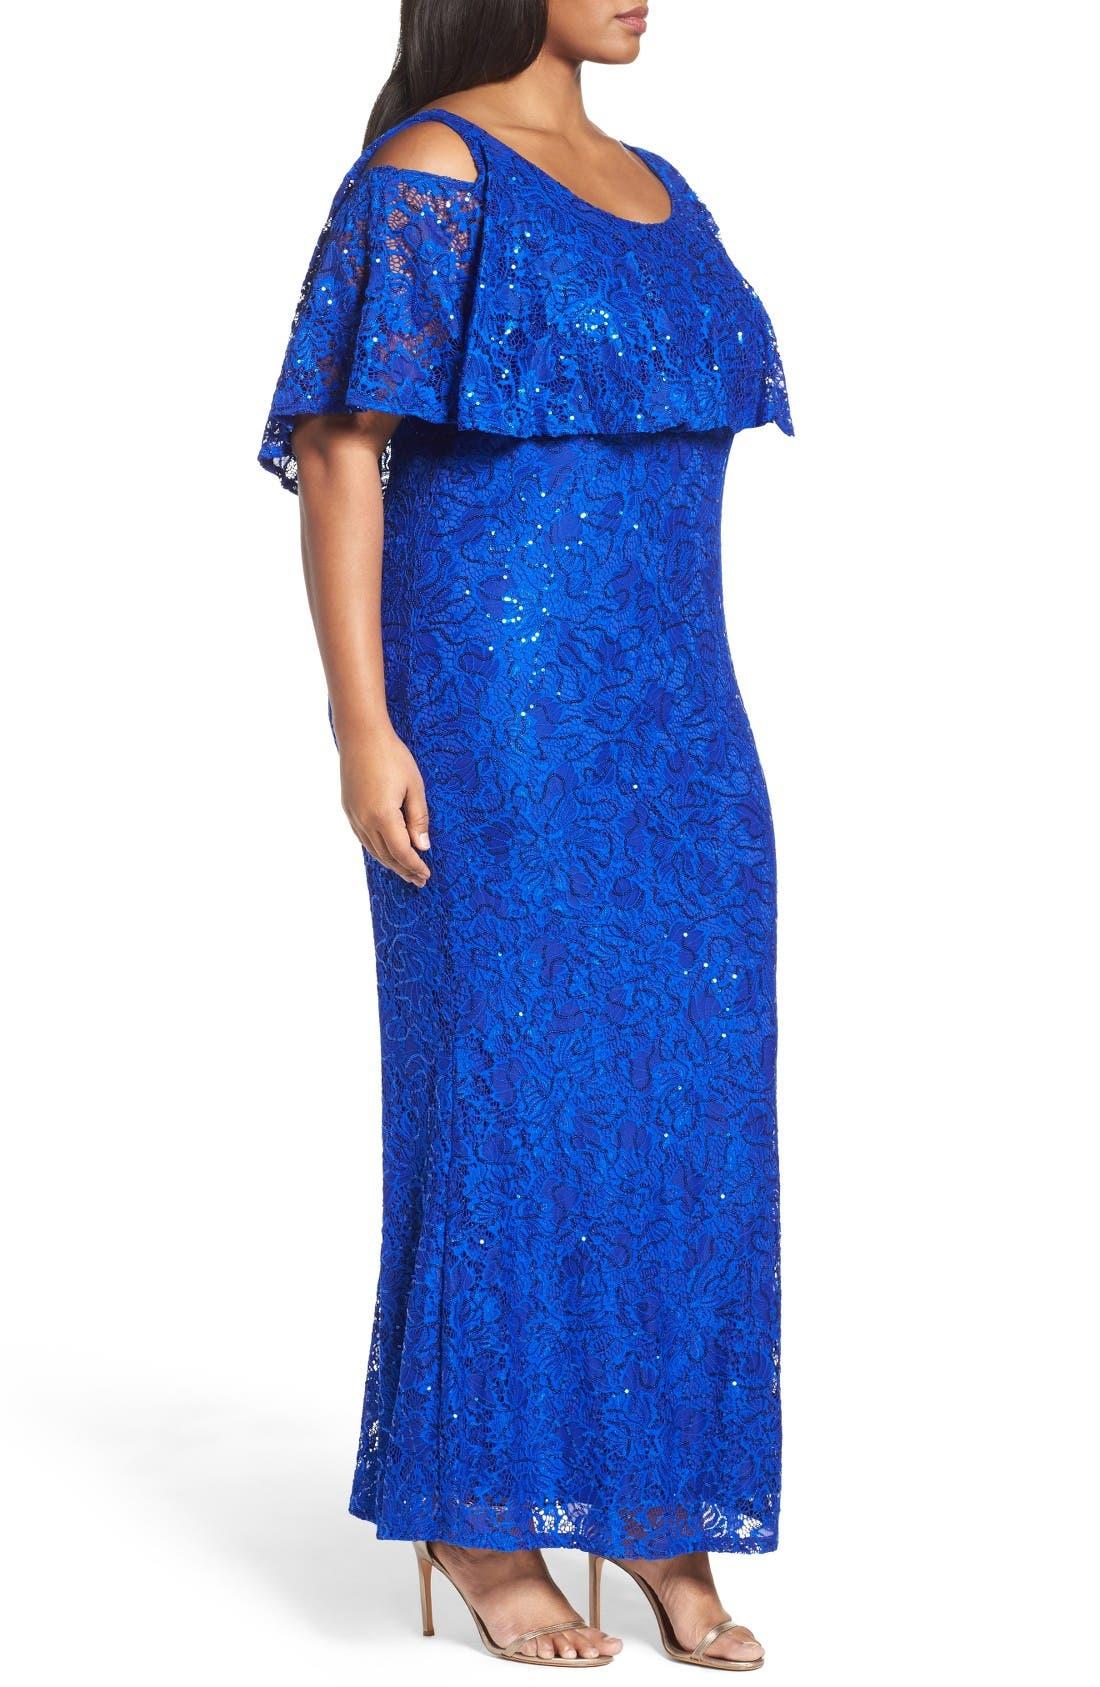 Alternate Image 3  - Marina Sequin Lace Cold Shoulder Long Dress (Plus Size)